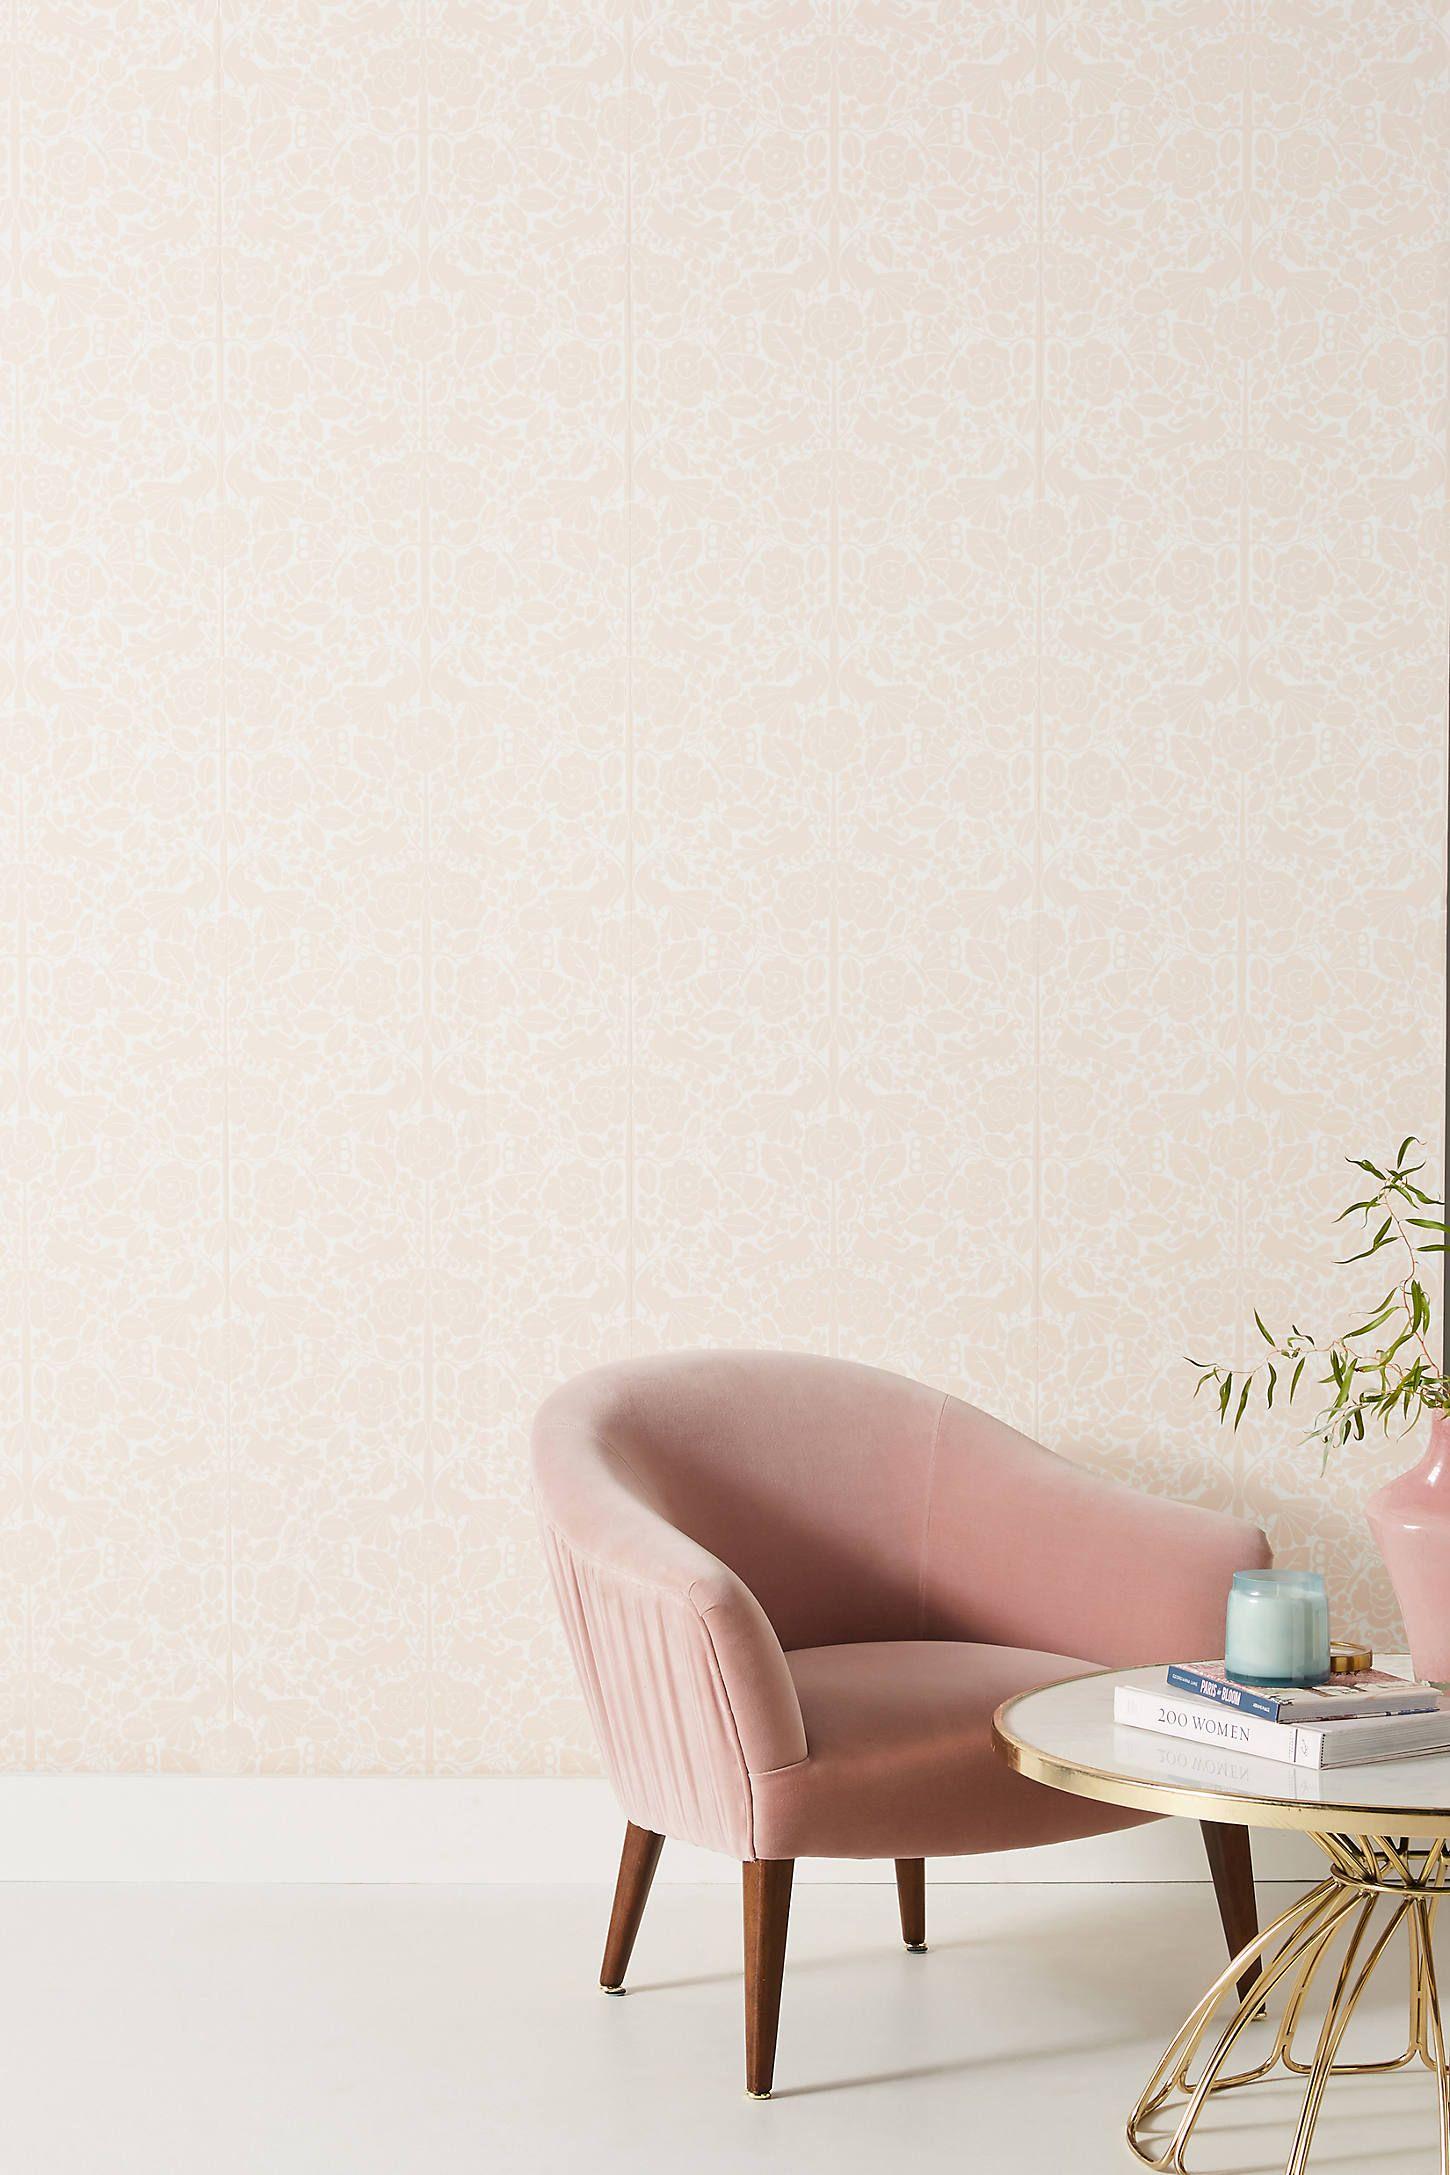 Magnolia Home Fairytales Wallpaper in 2020 Magnolia